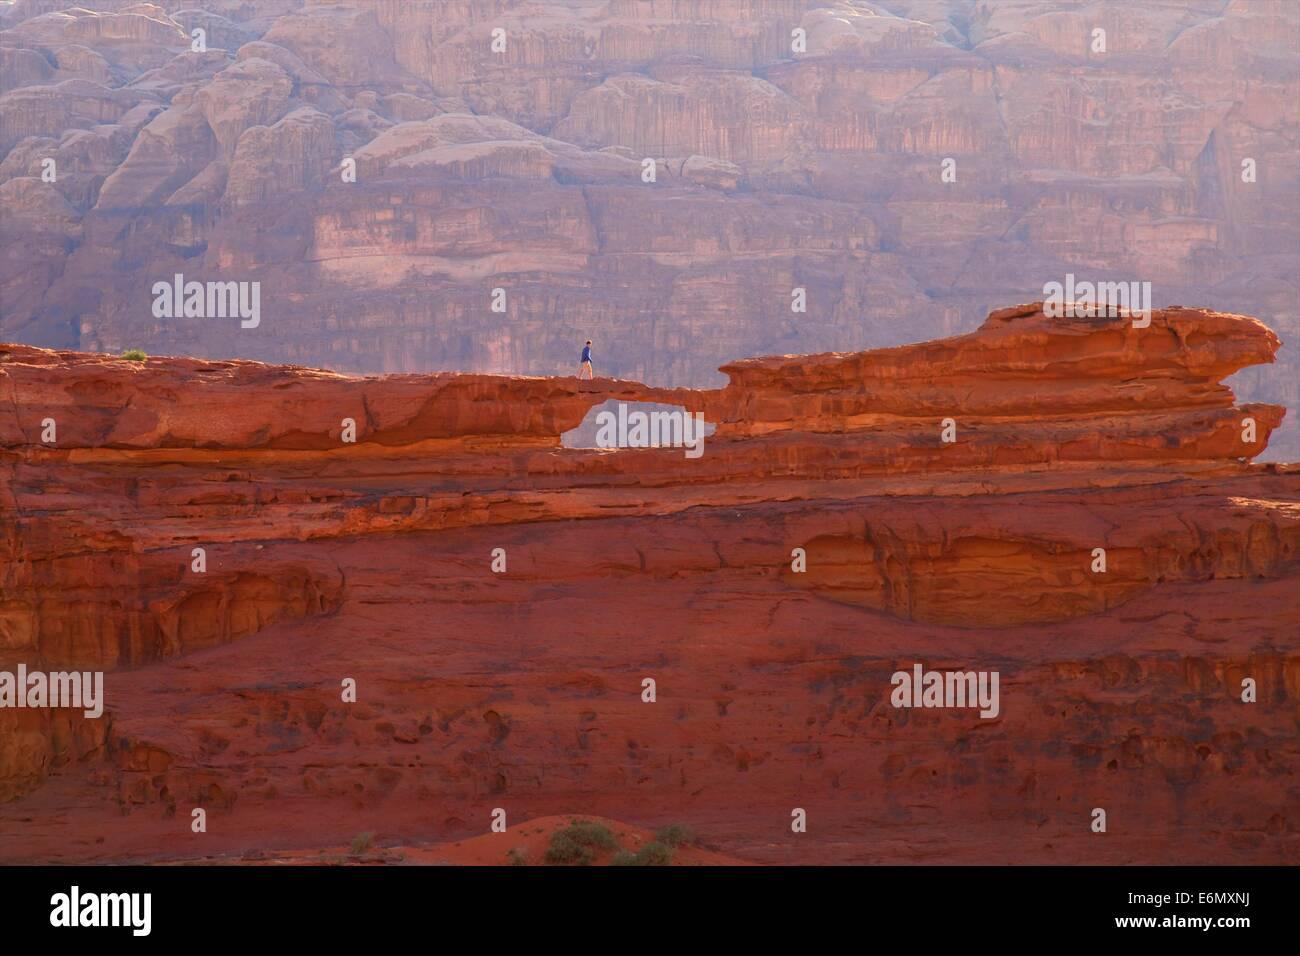 Tourist à Wadi Rum, Jordanie, Moyen-Orient Photo Stock